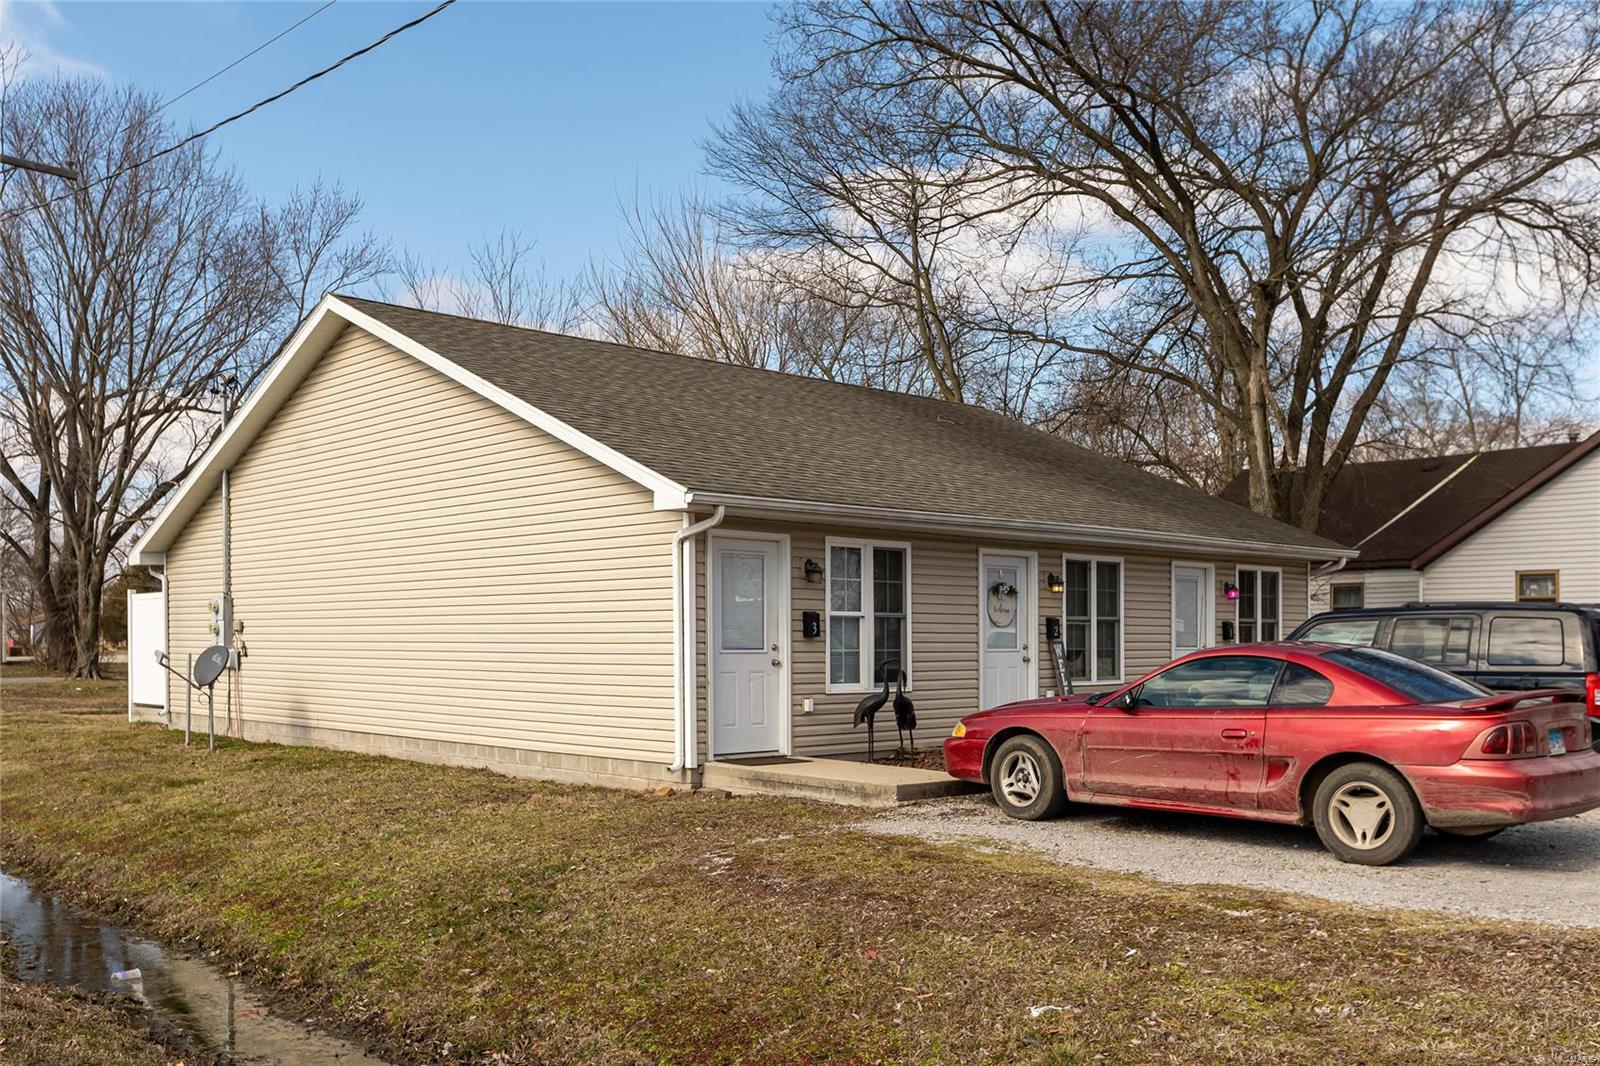 229 S Walnut Property Photo - Duquoin, IL real estate listing